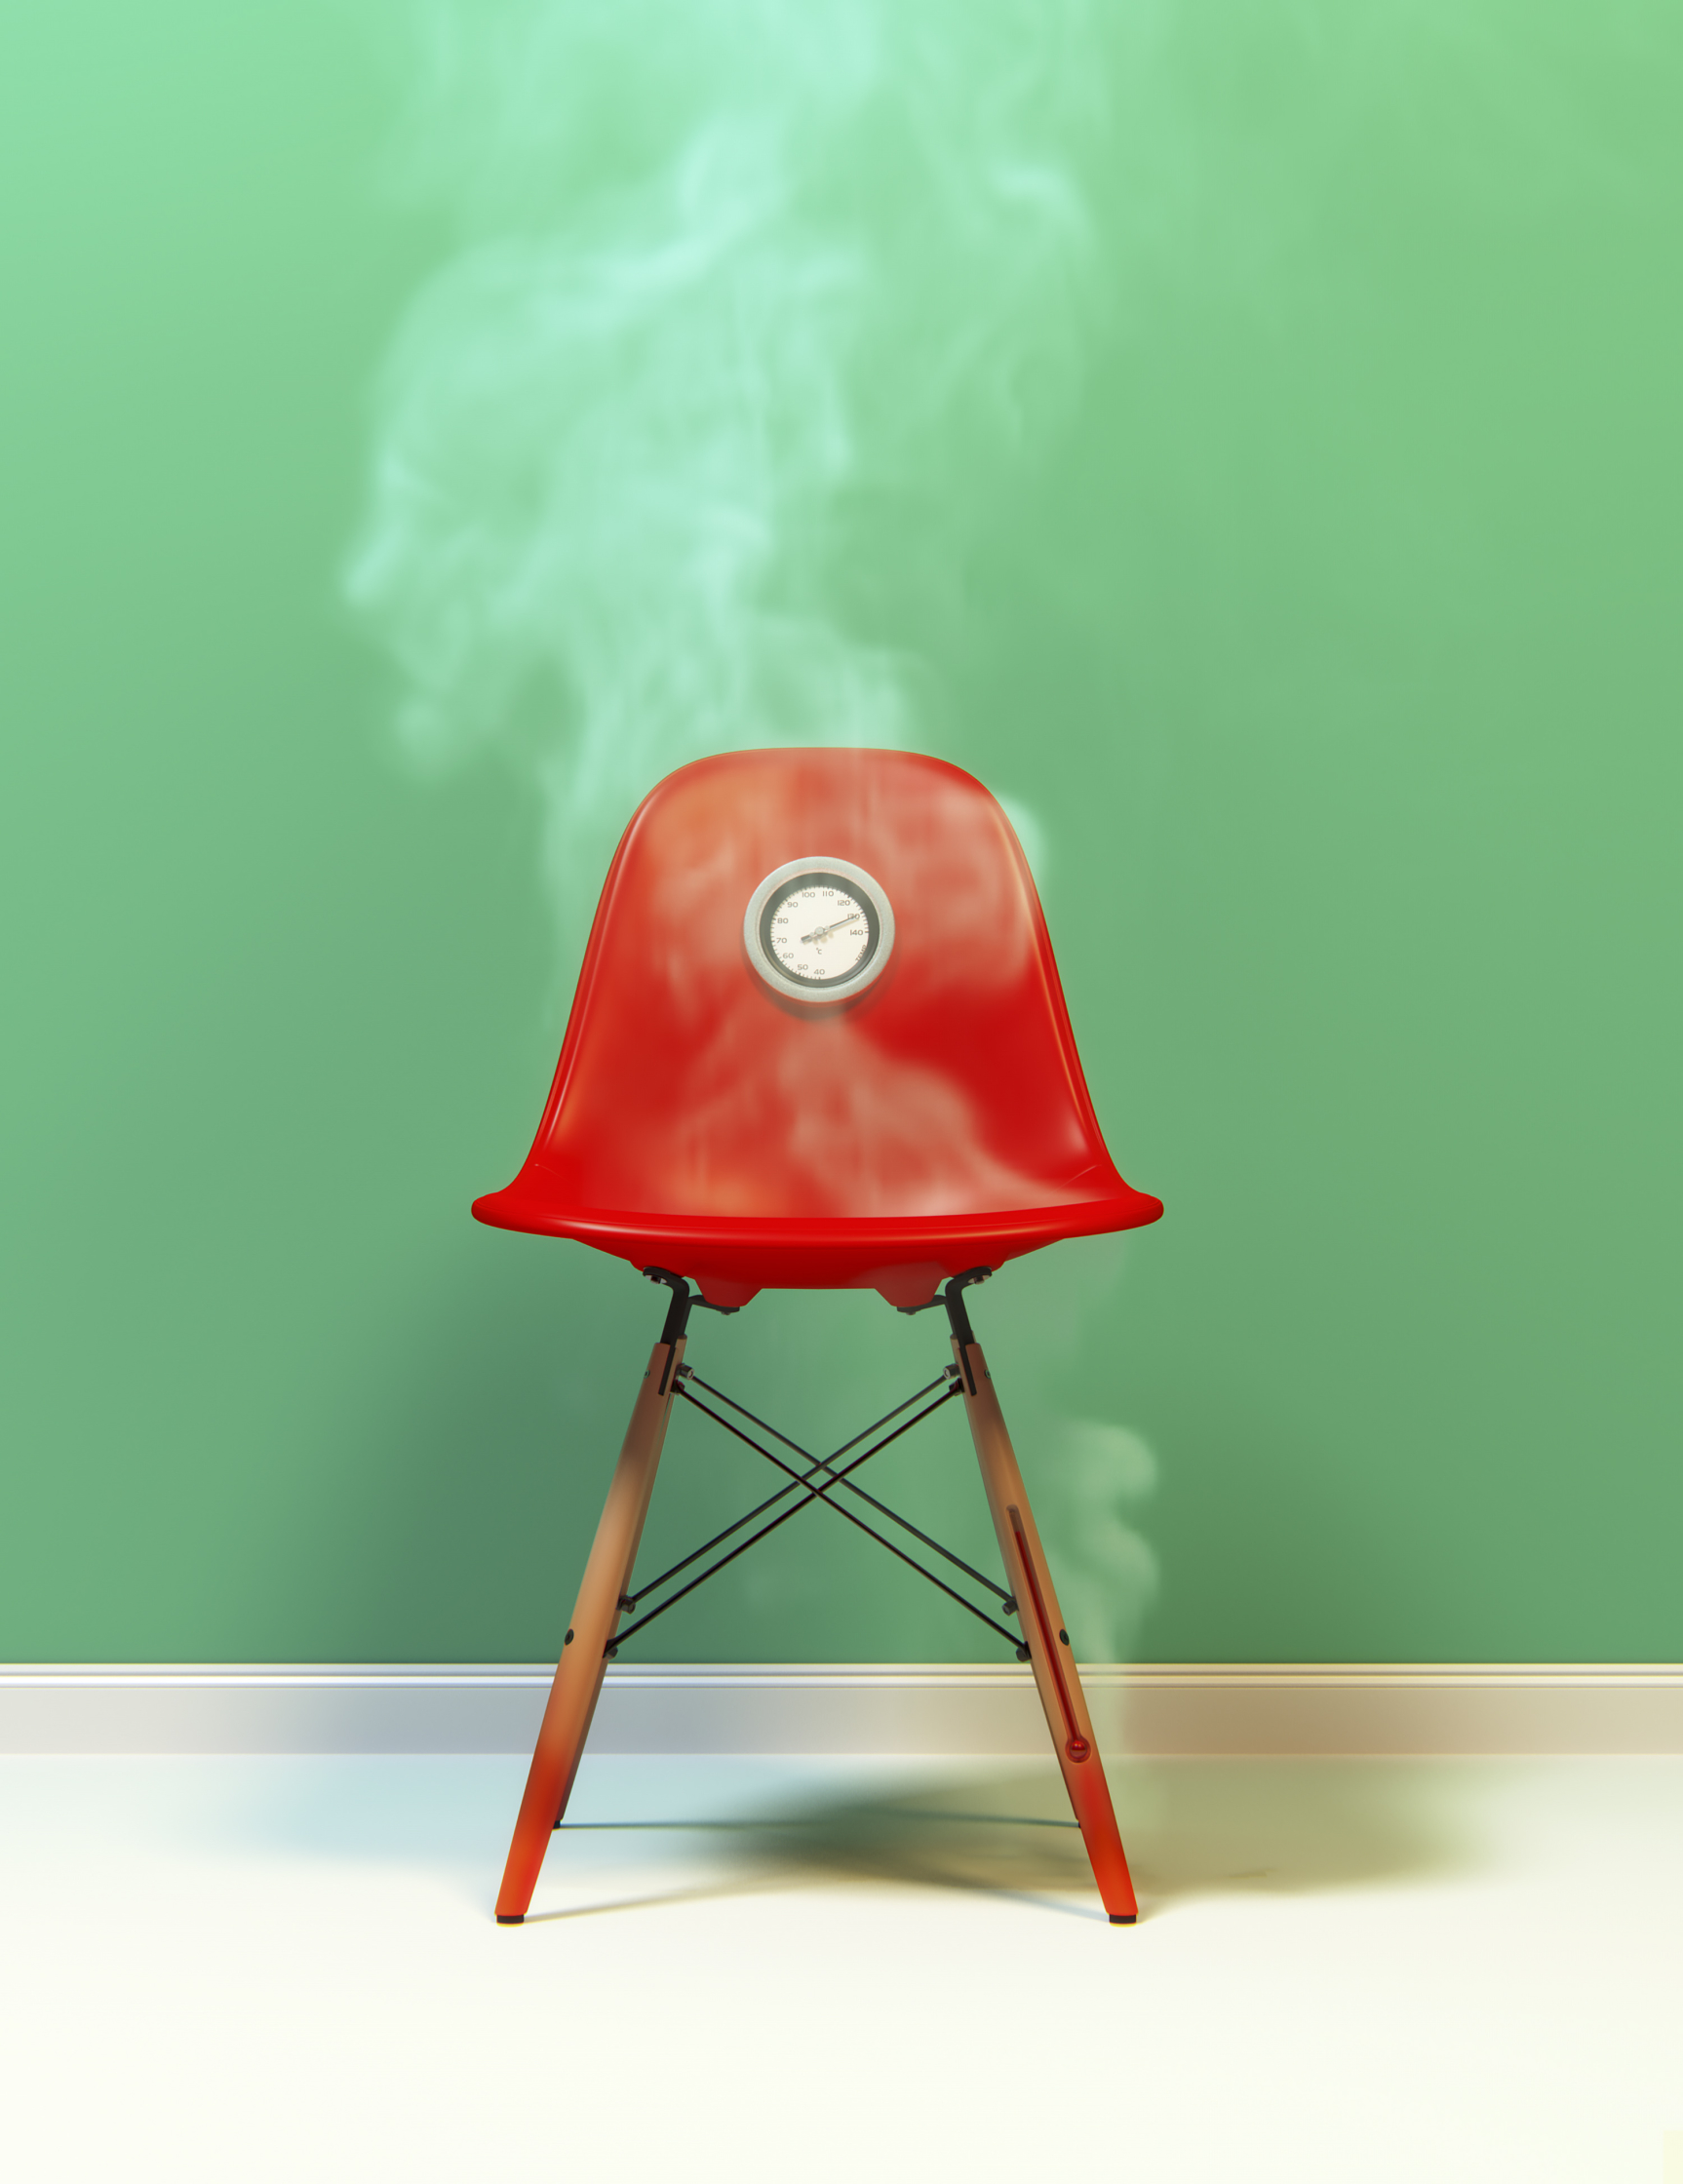 Hot Seat Chair Men's Health Magazine